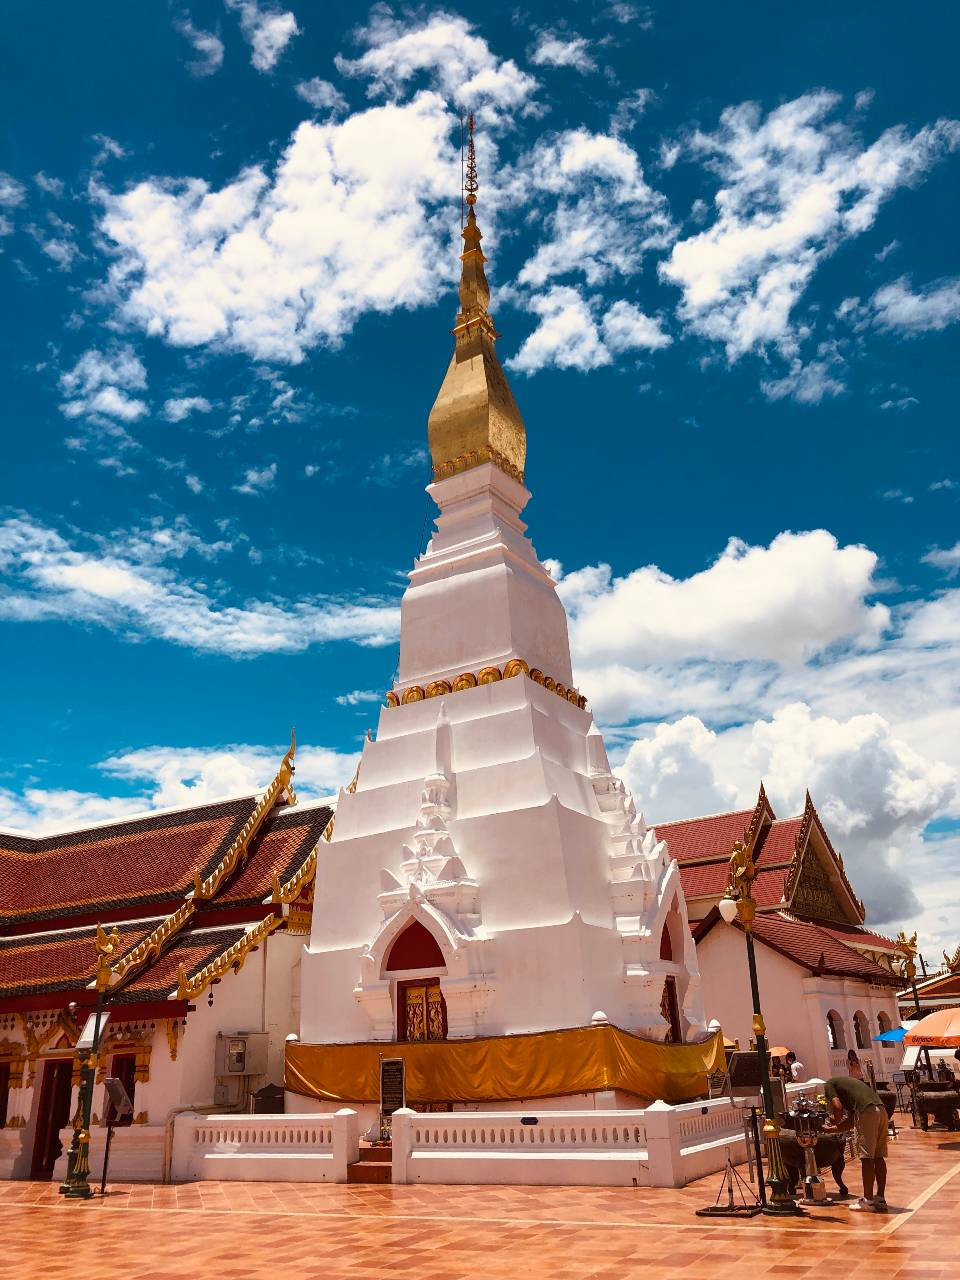 Wat Phra That Choeng Chum in Sakon Nakhon, Thailand